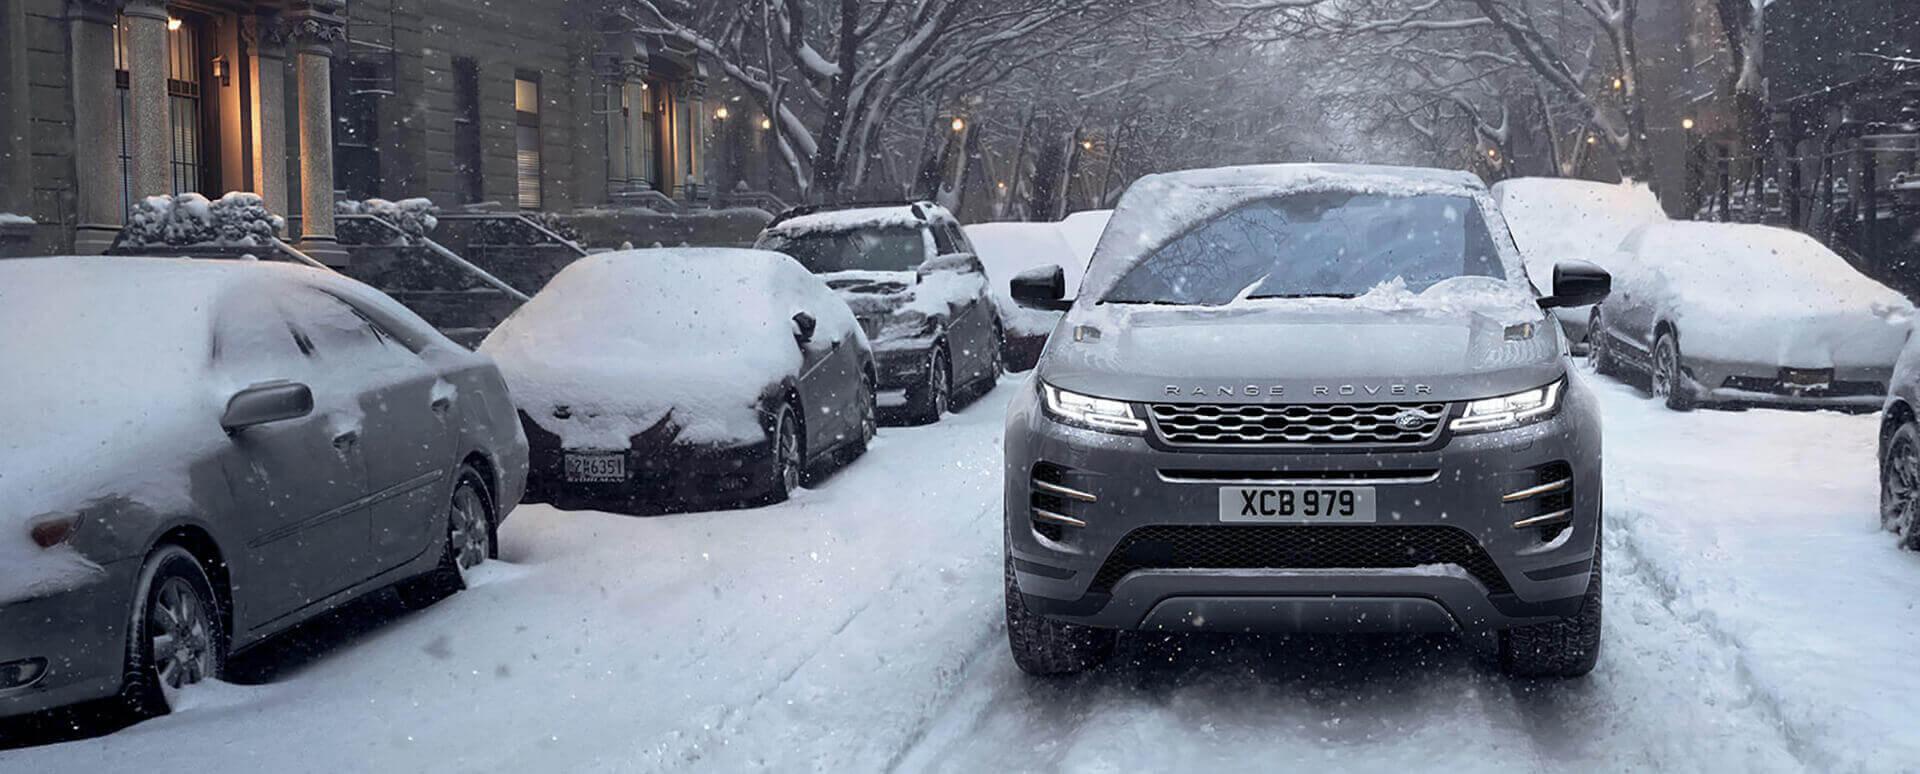 Range Rover Evoque Driving in Snow